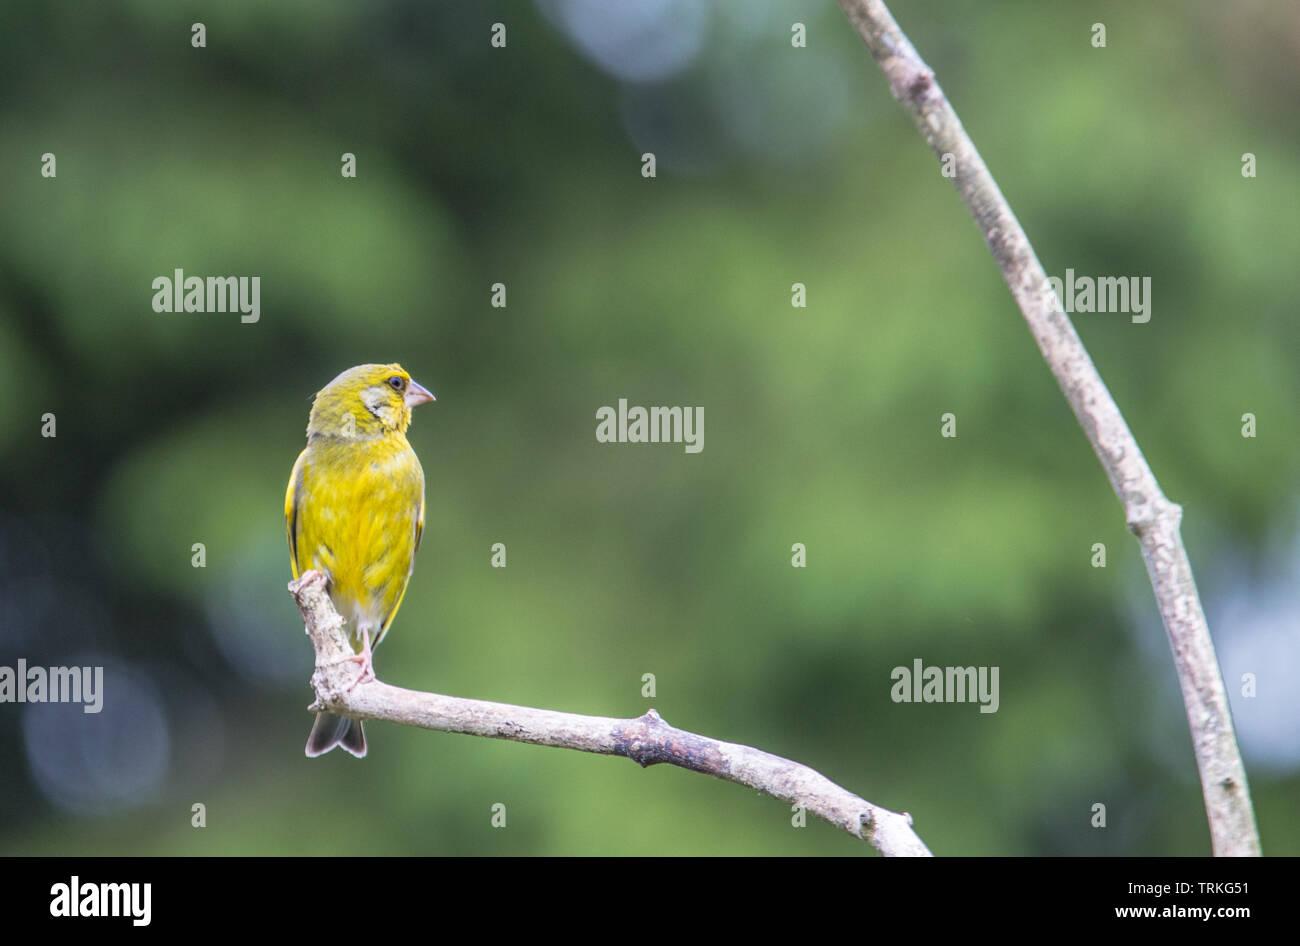 Greenfinch, British Bird, Wildlife enjoying the sunshine on a perch in a British Garden. - Stock Image